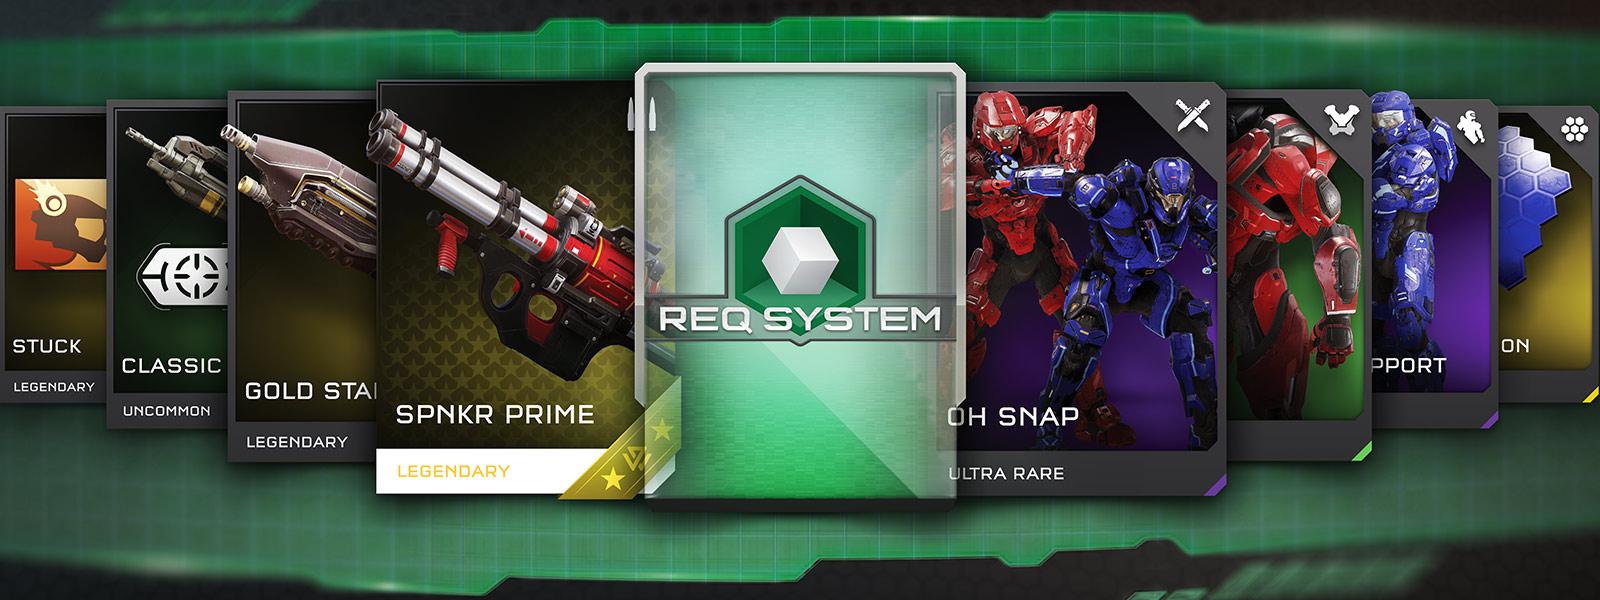 REQ 系統遊戲內卡片